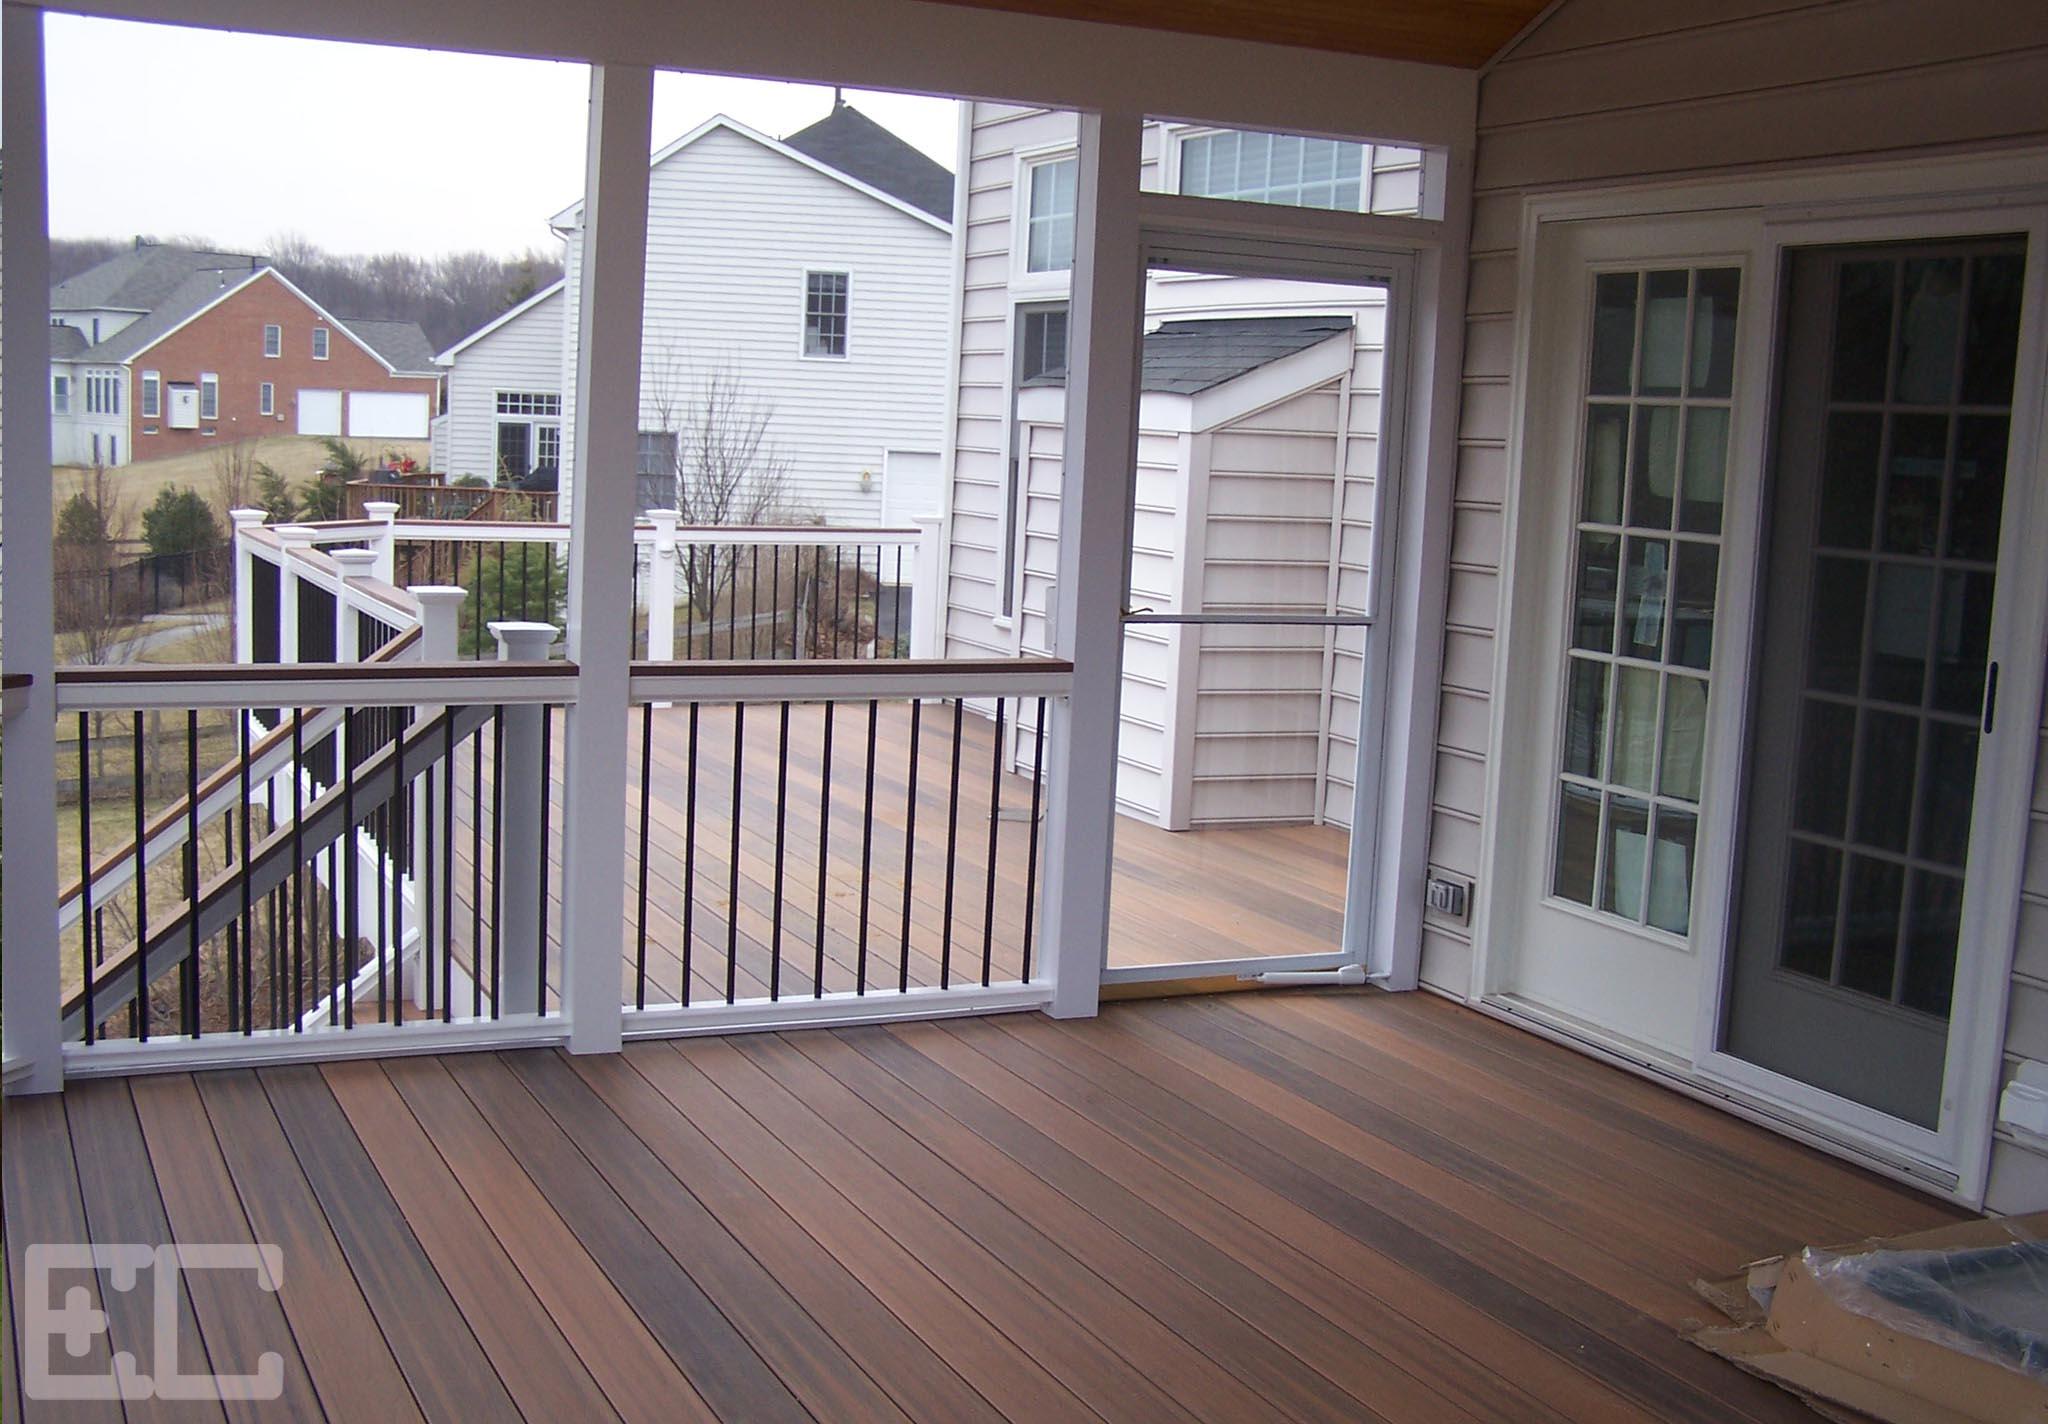 Upper Deck with Porch